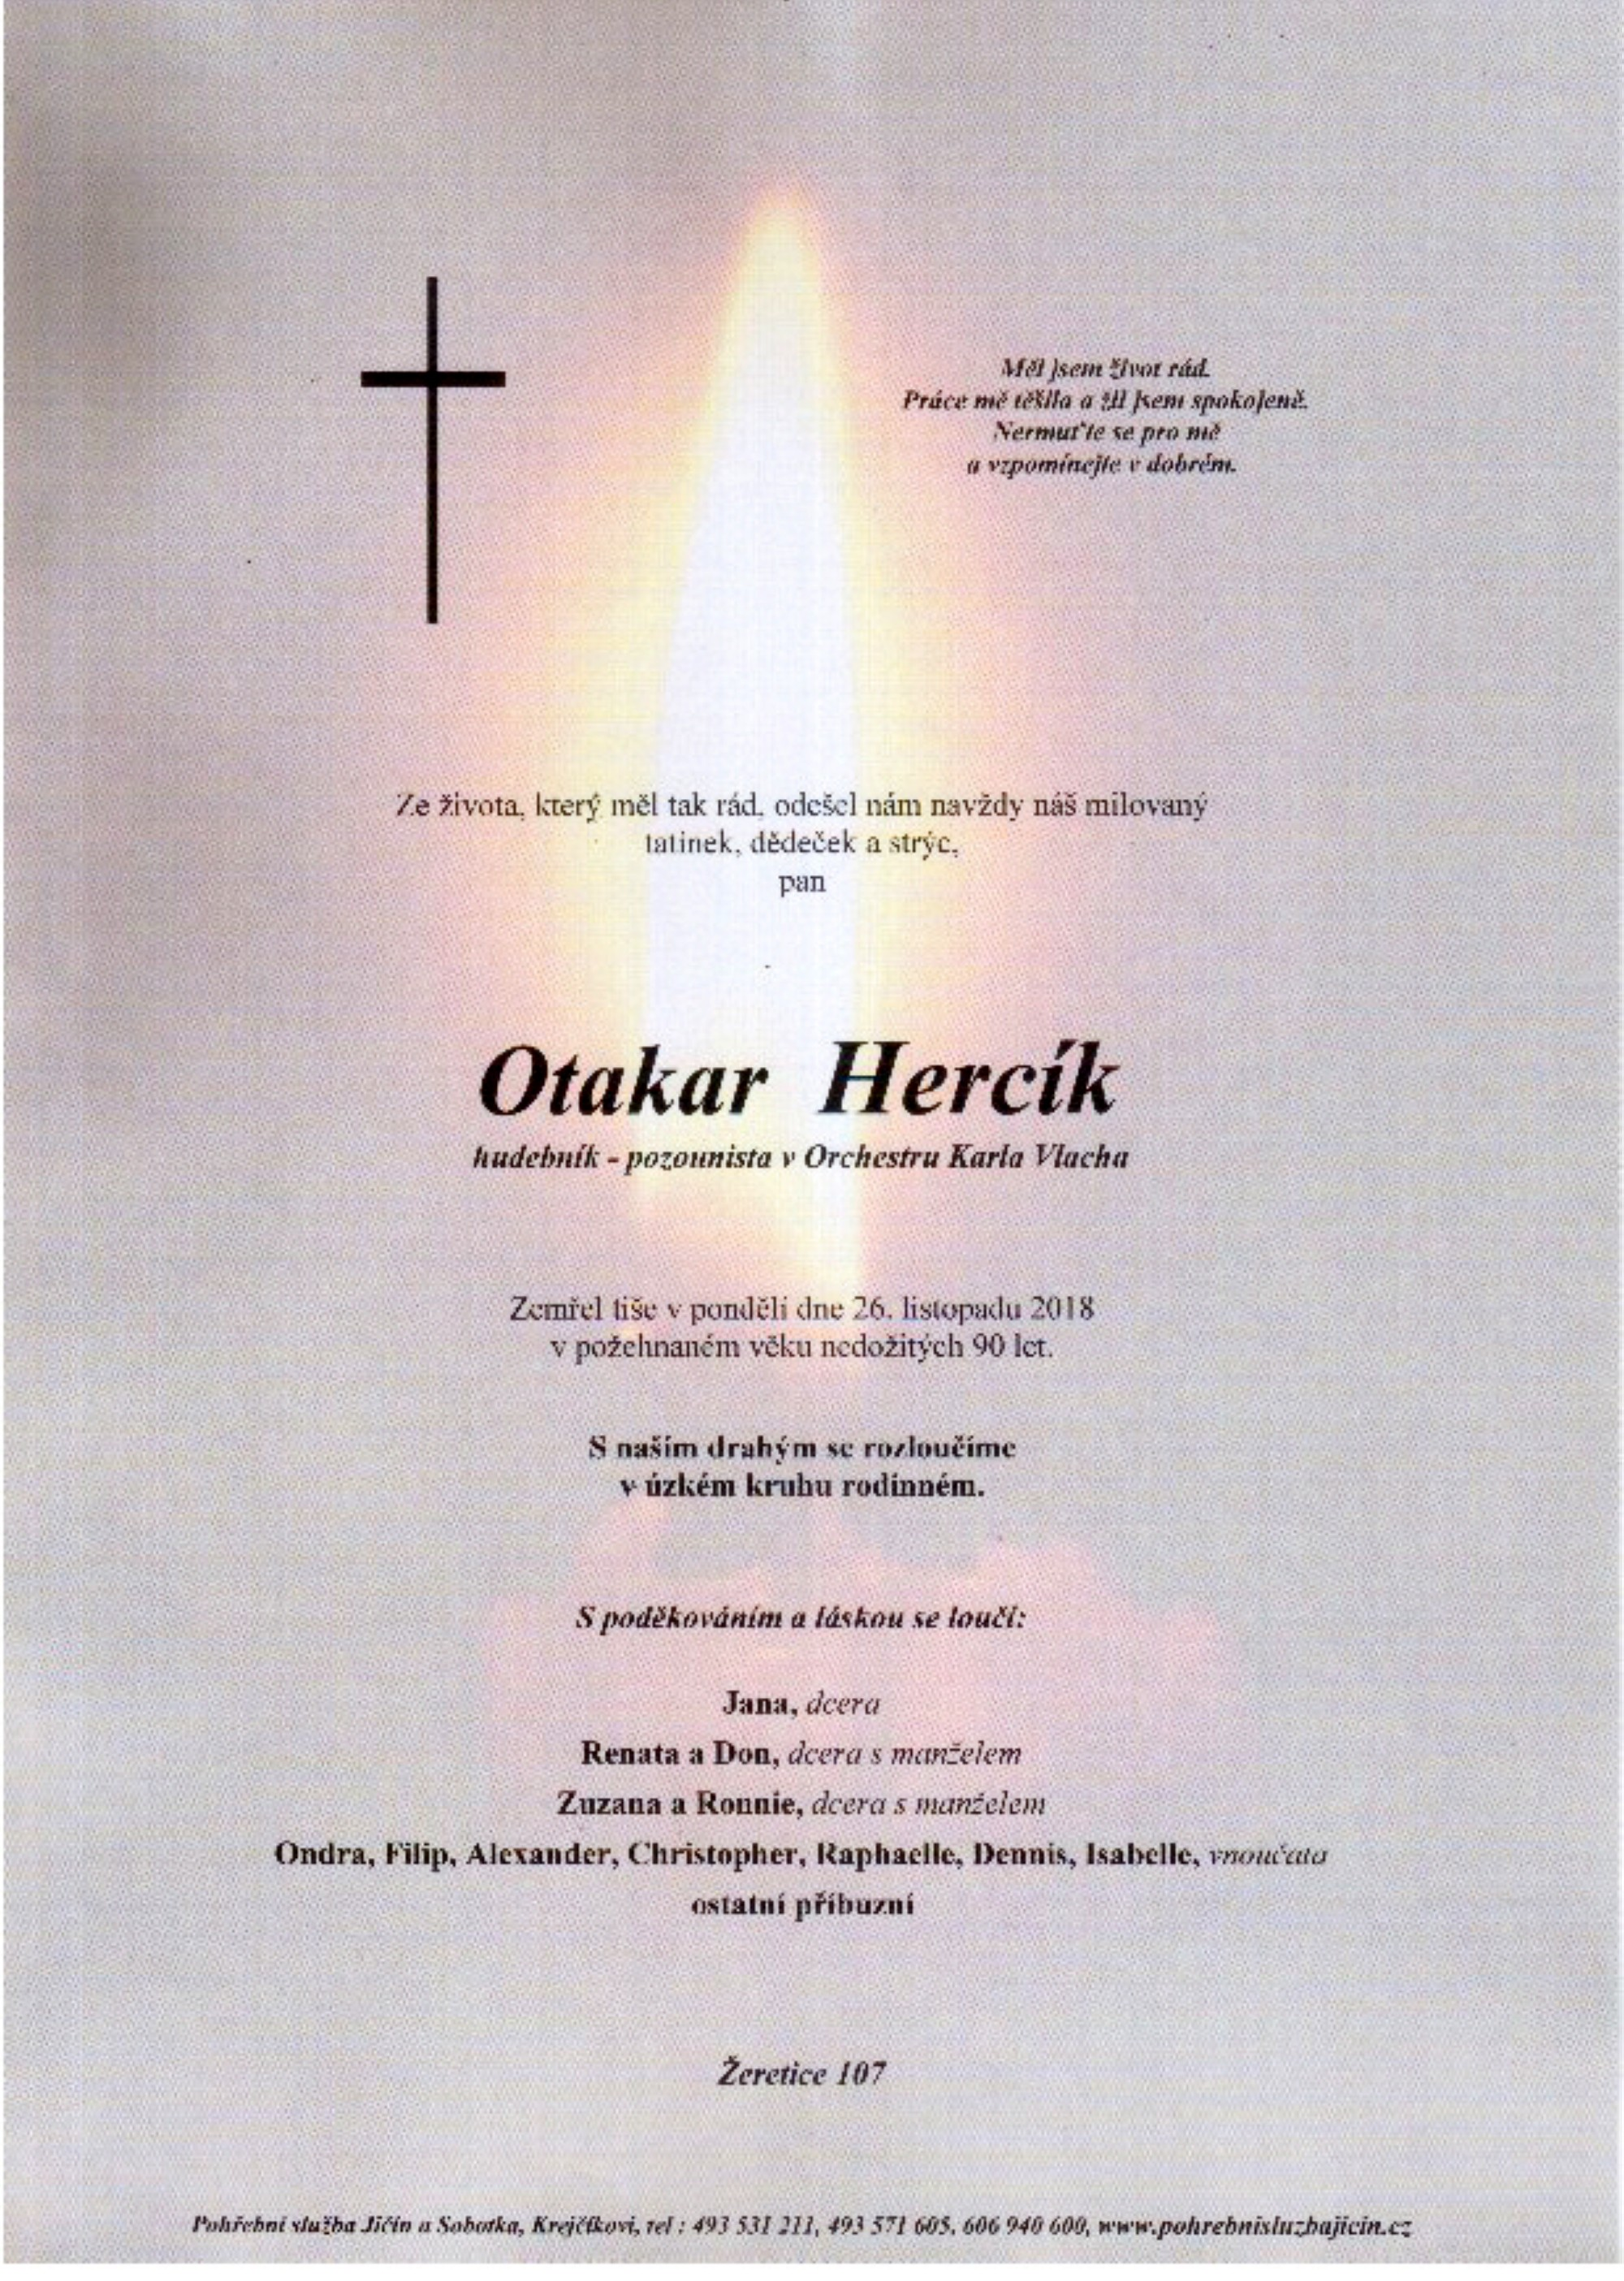 Otakar Hercík